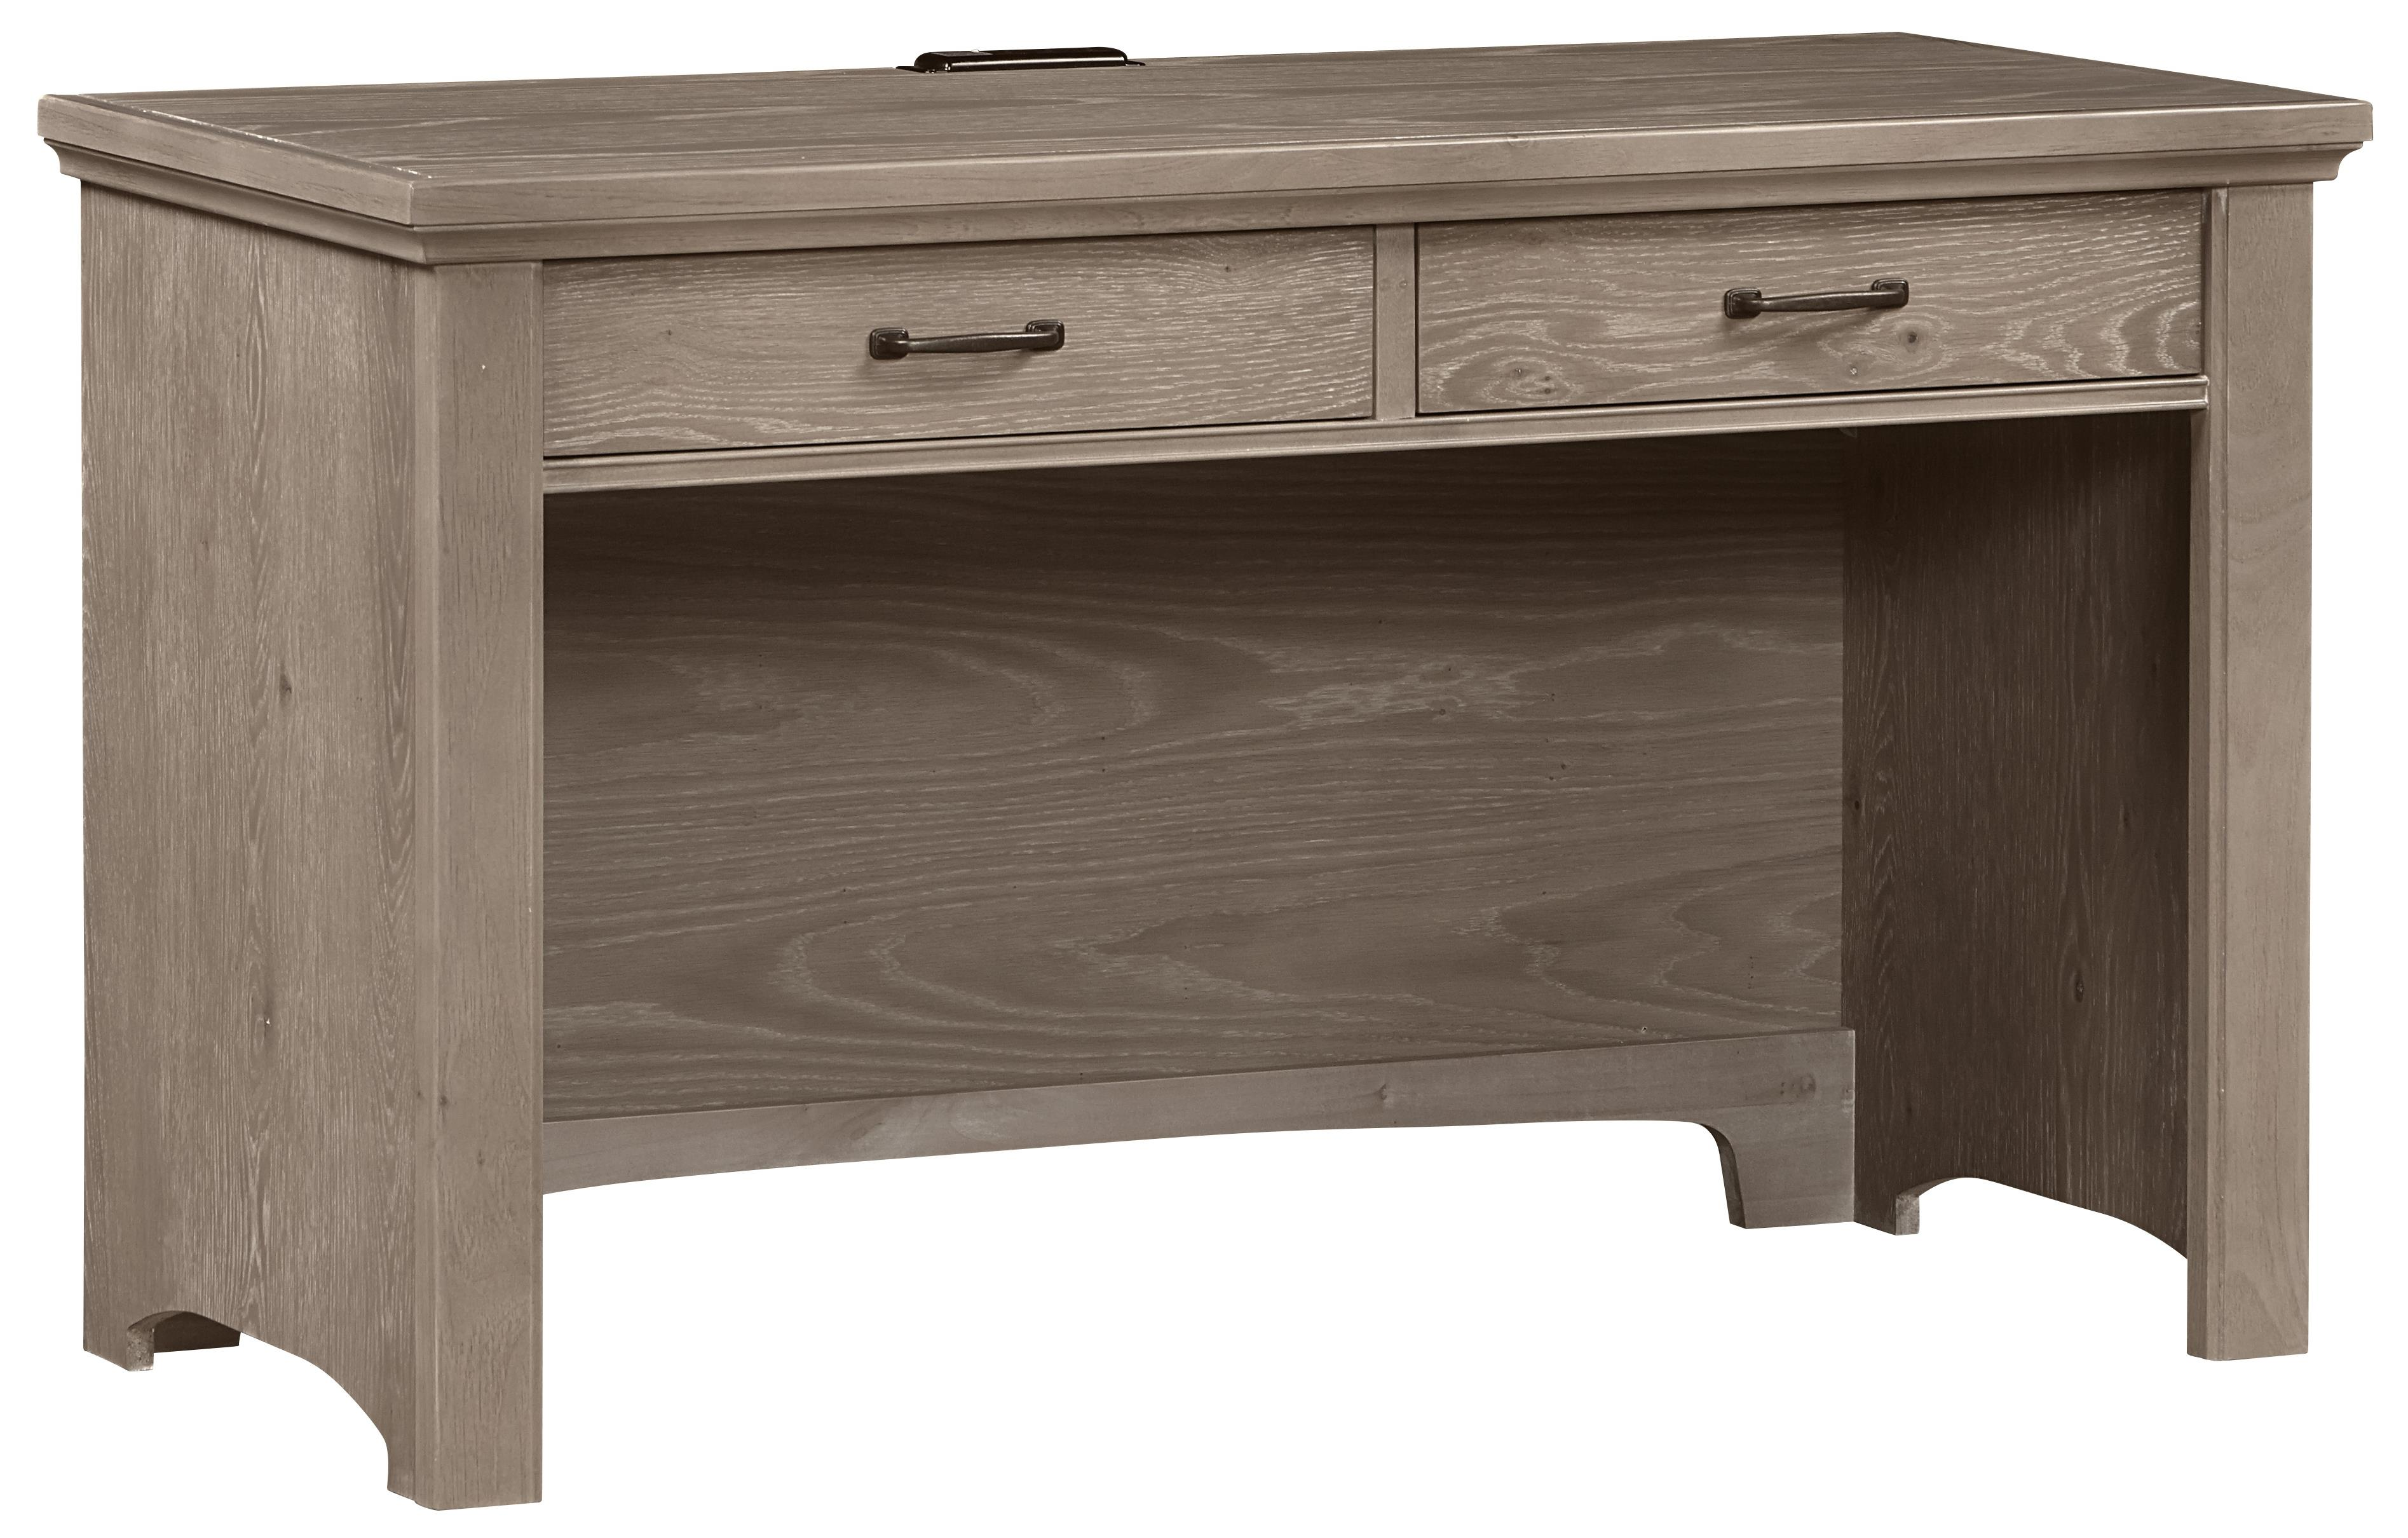 Transitions Laptop Desk - 2 Drawers & Power Pack by Vaughan Bassett at Lapeer Furniture & Mattress Center